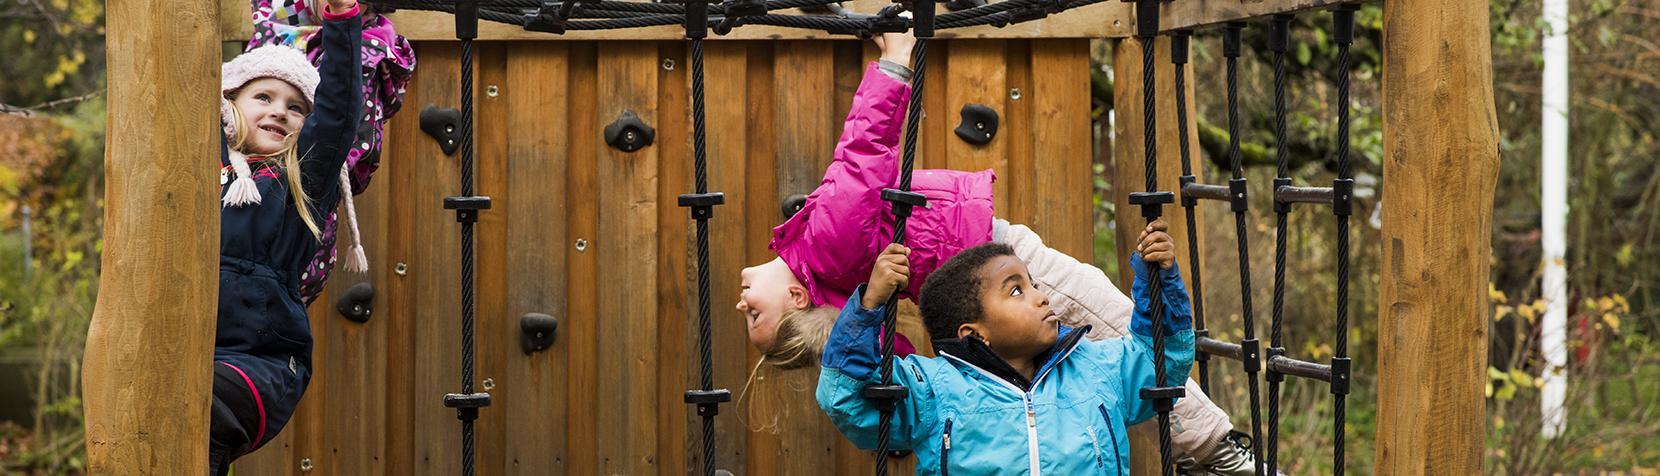 Børn i klatrestativ